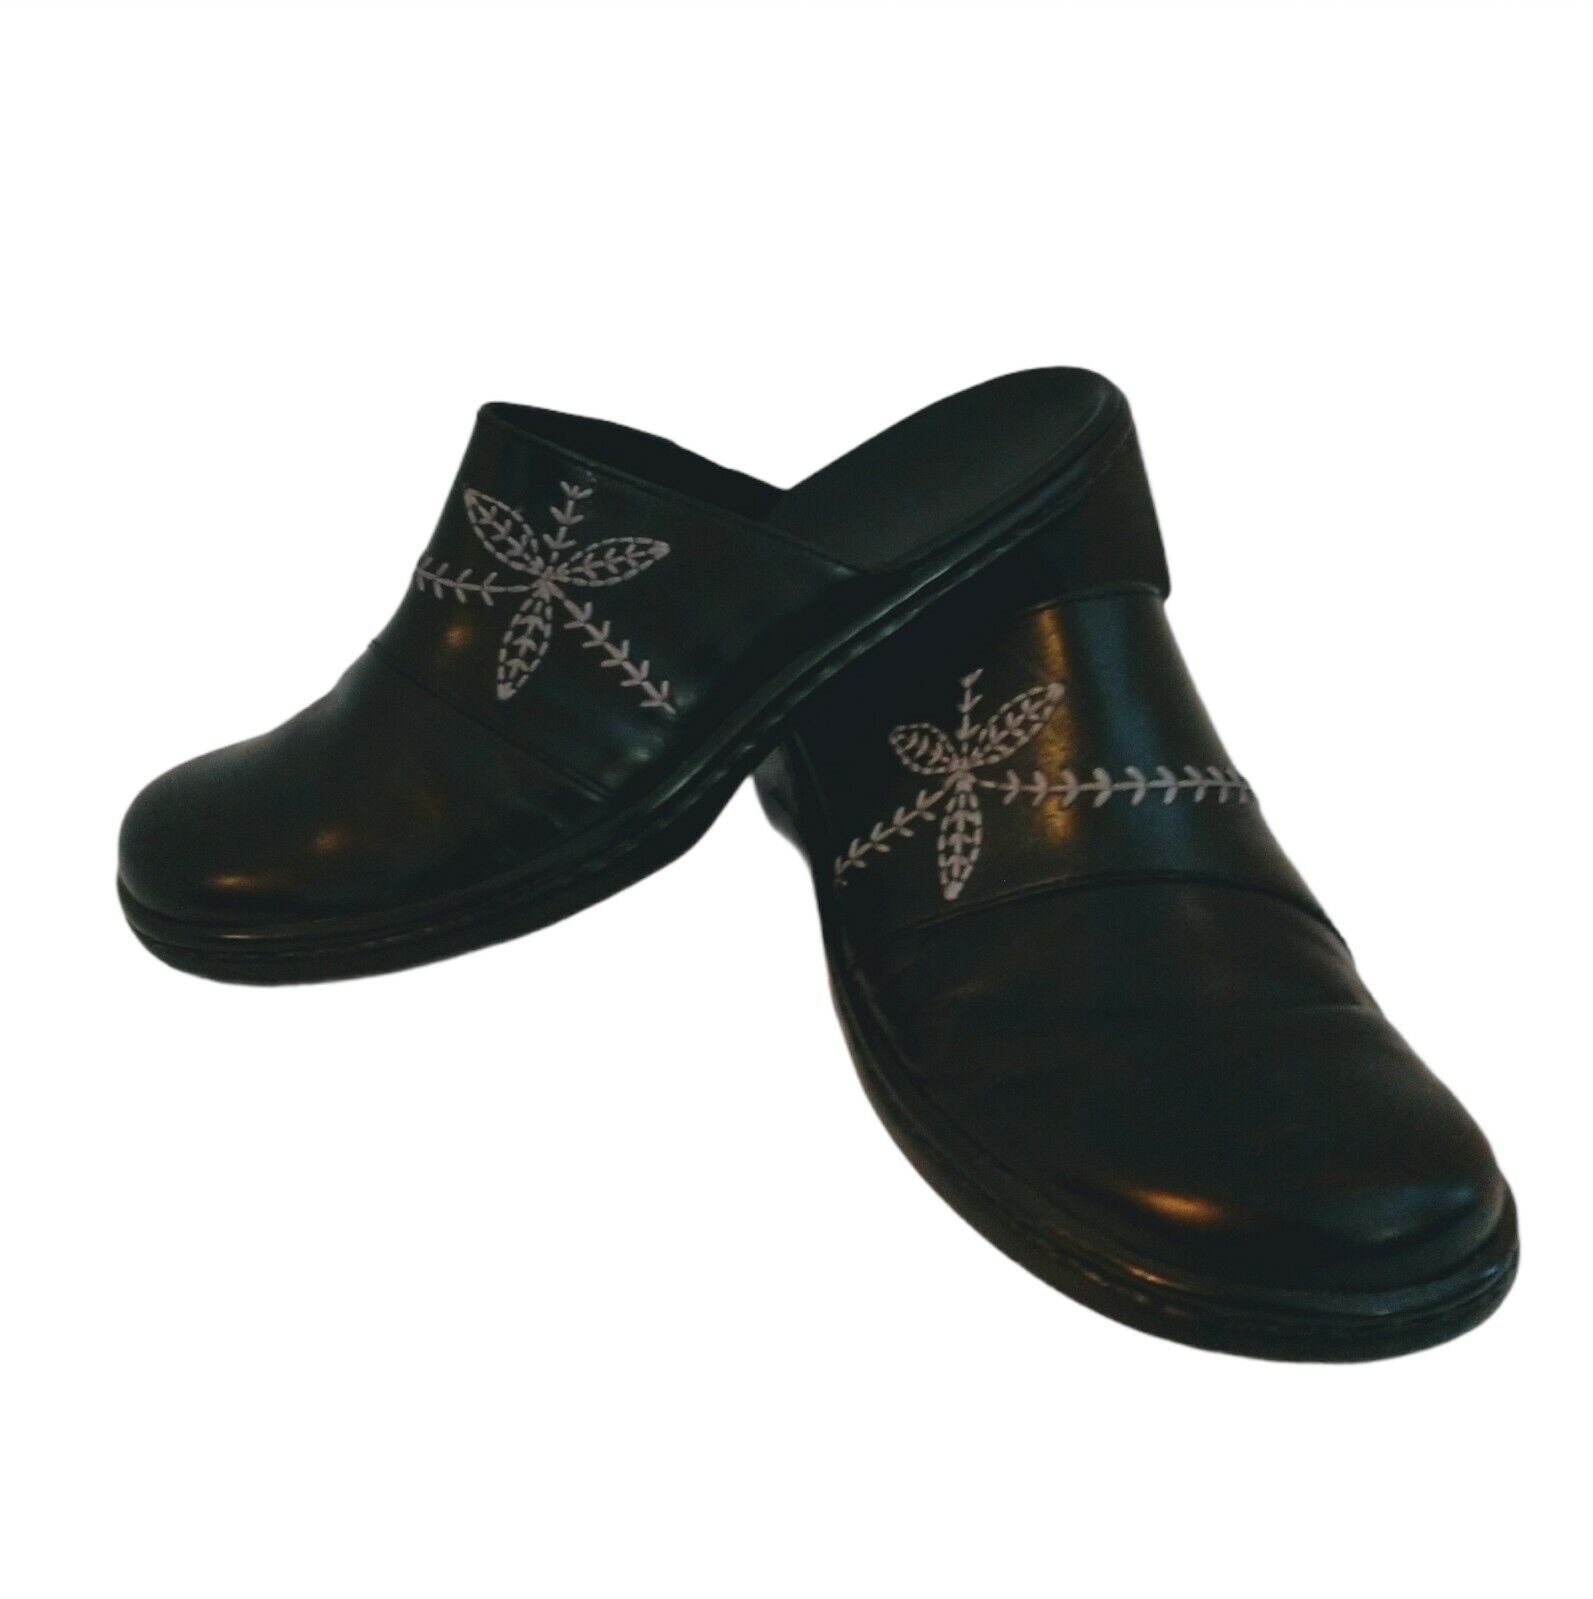 Clarks Womens Comfort Clogs Leather Black Shoes Size 6.5 Stitched Leaf Design